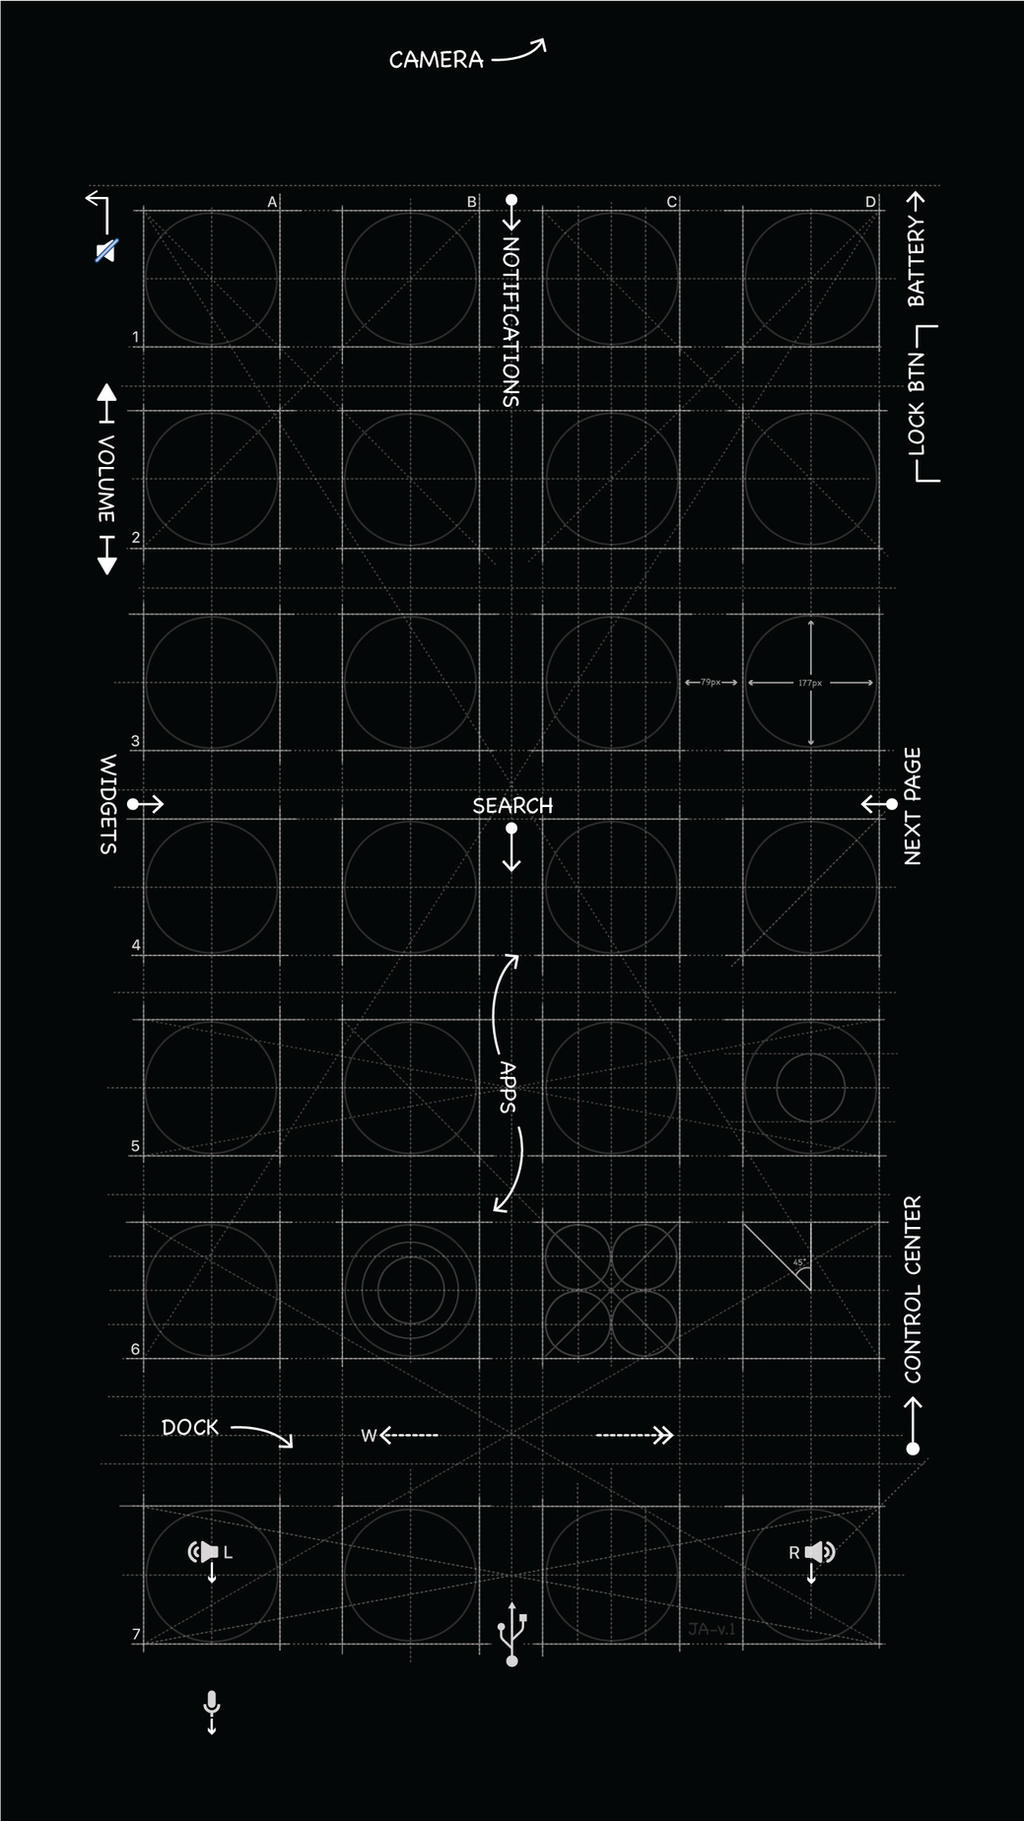 Iphone x blueprint wallpaper by mrdude42 on deviantart blueprint iphone6 8 wallpaper by mrdude42 malvernweather Choice Image